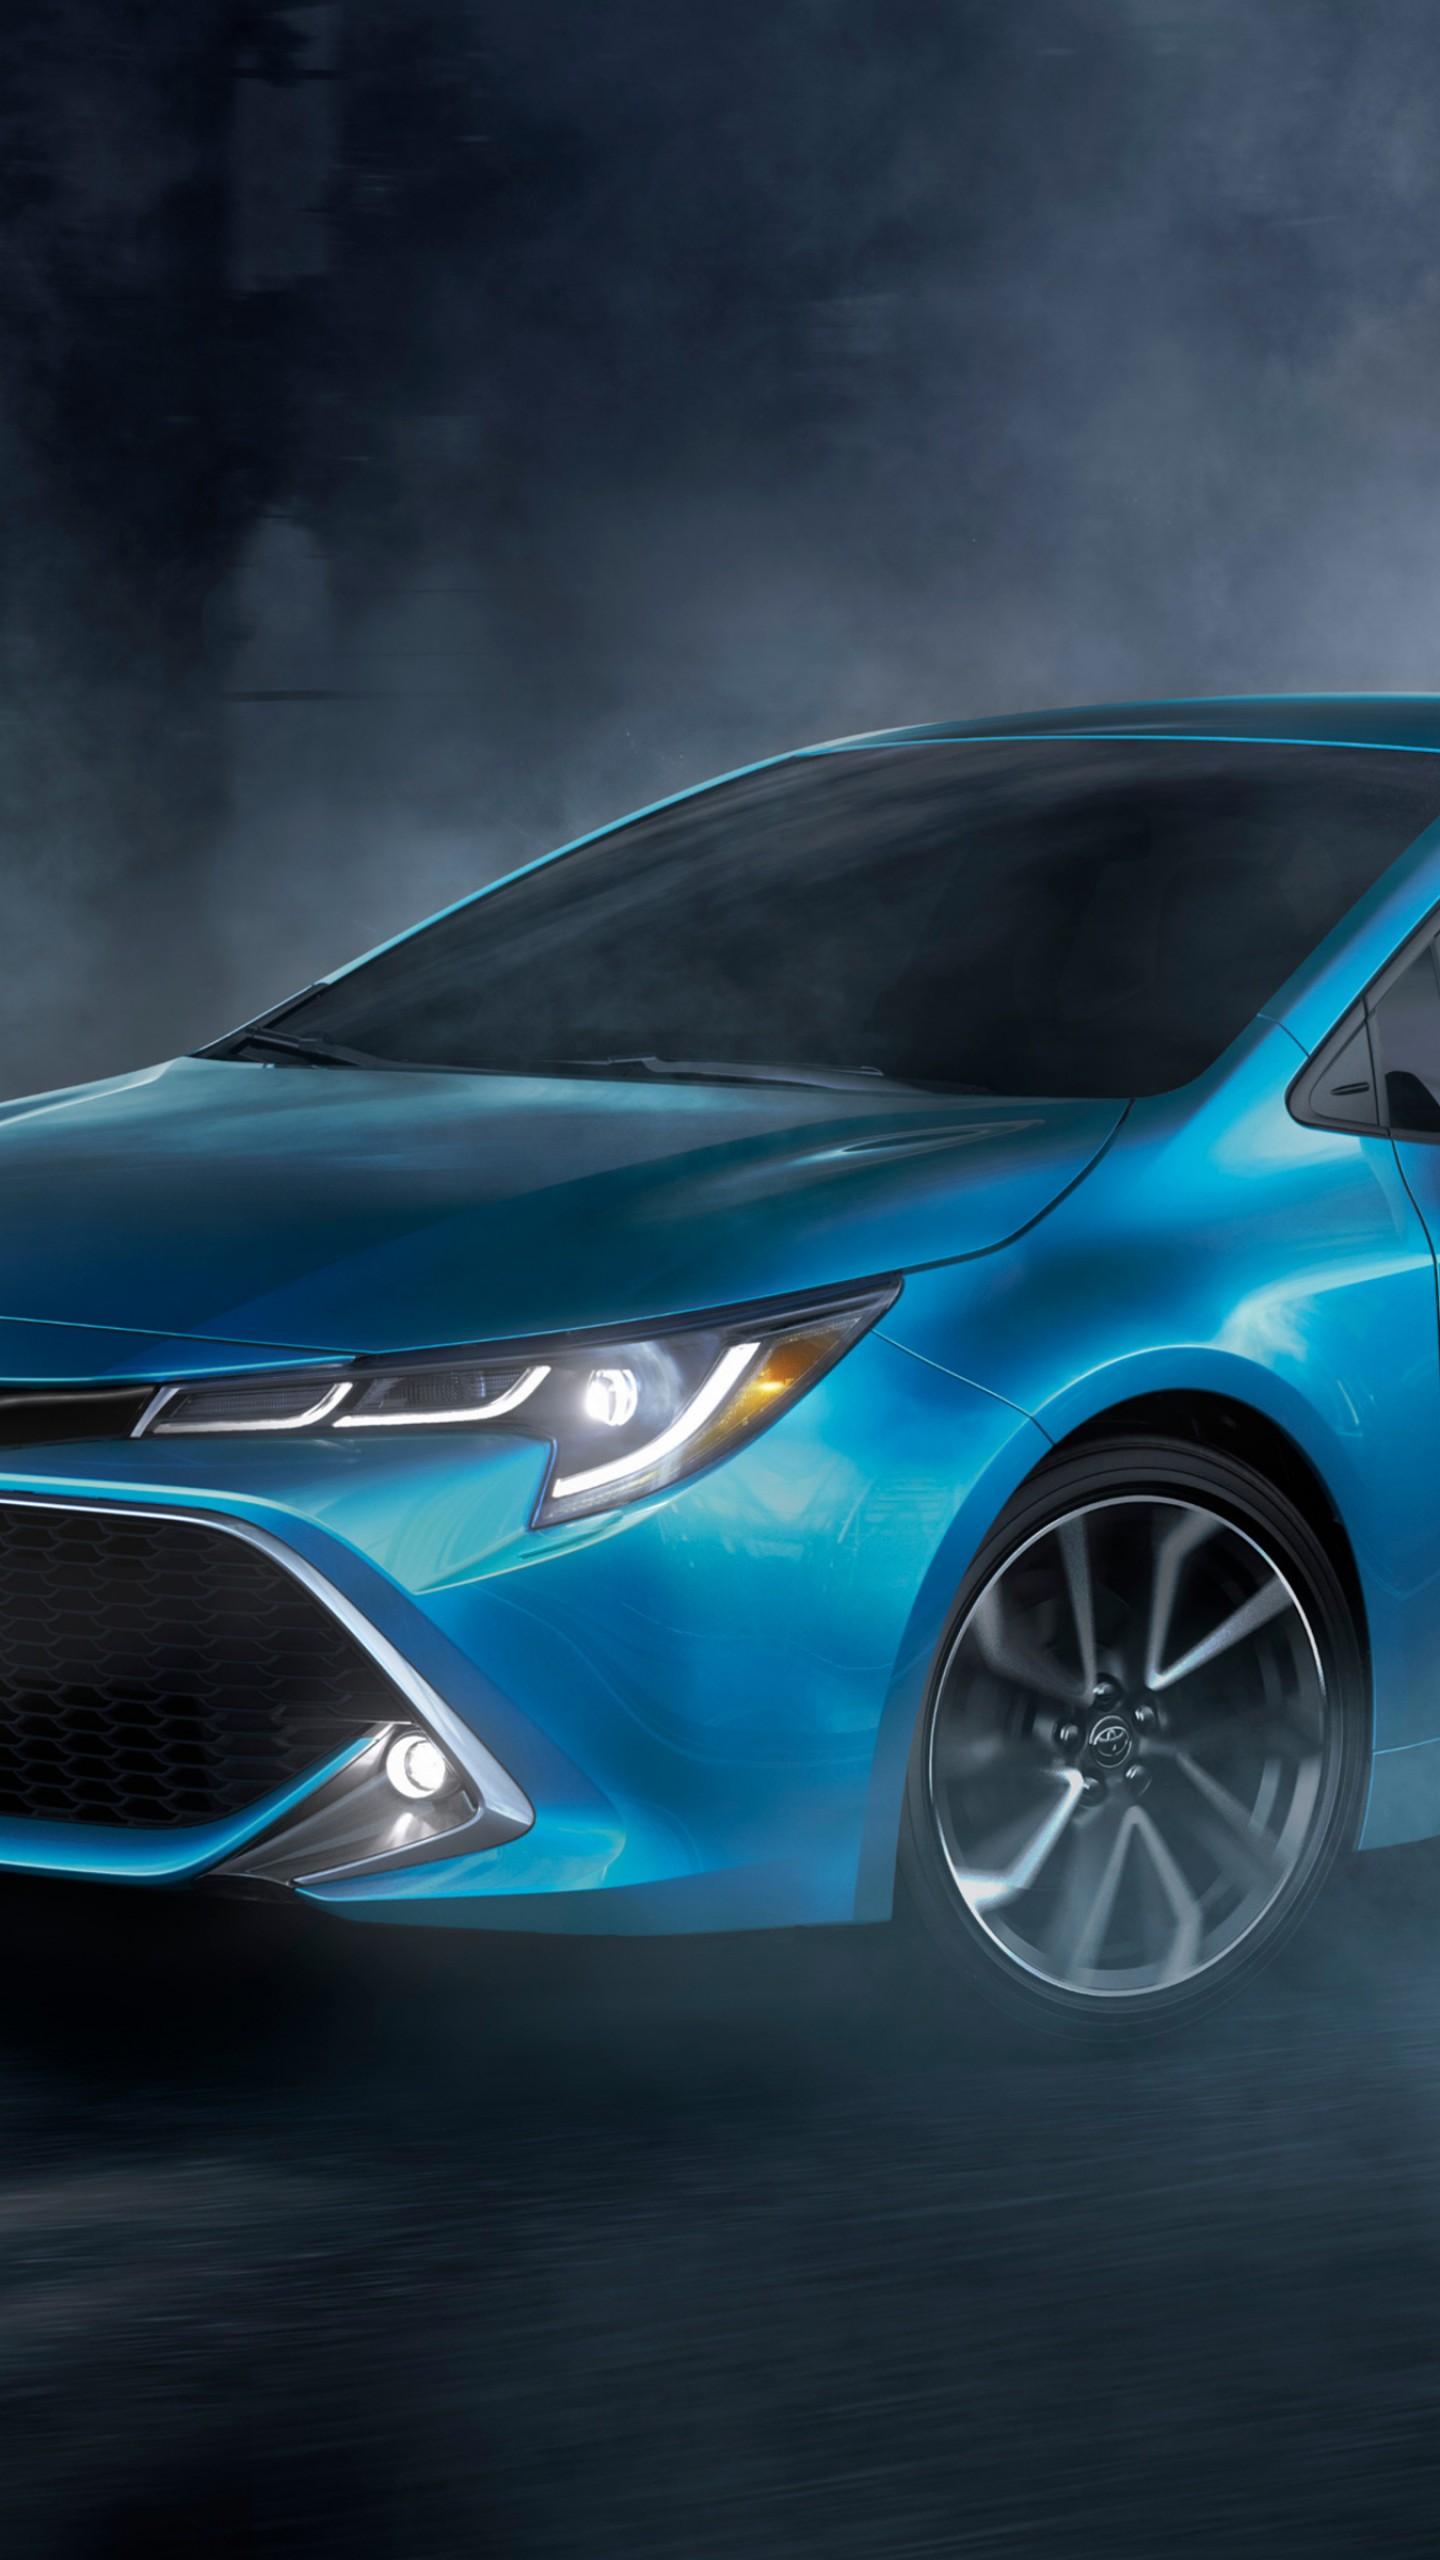 Wallpaper Toyota Corolla Hatchback 2019 Cars 4k Cars